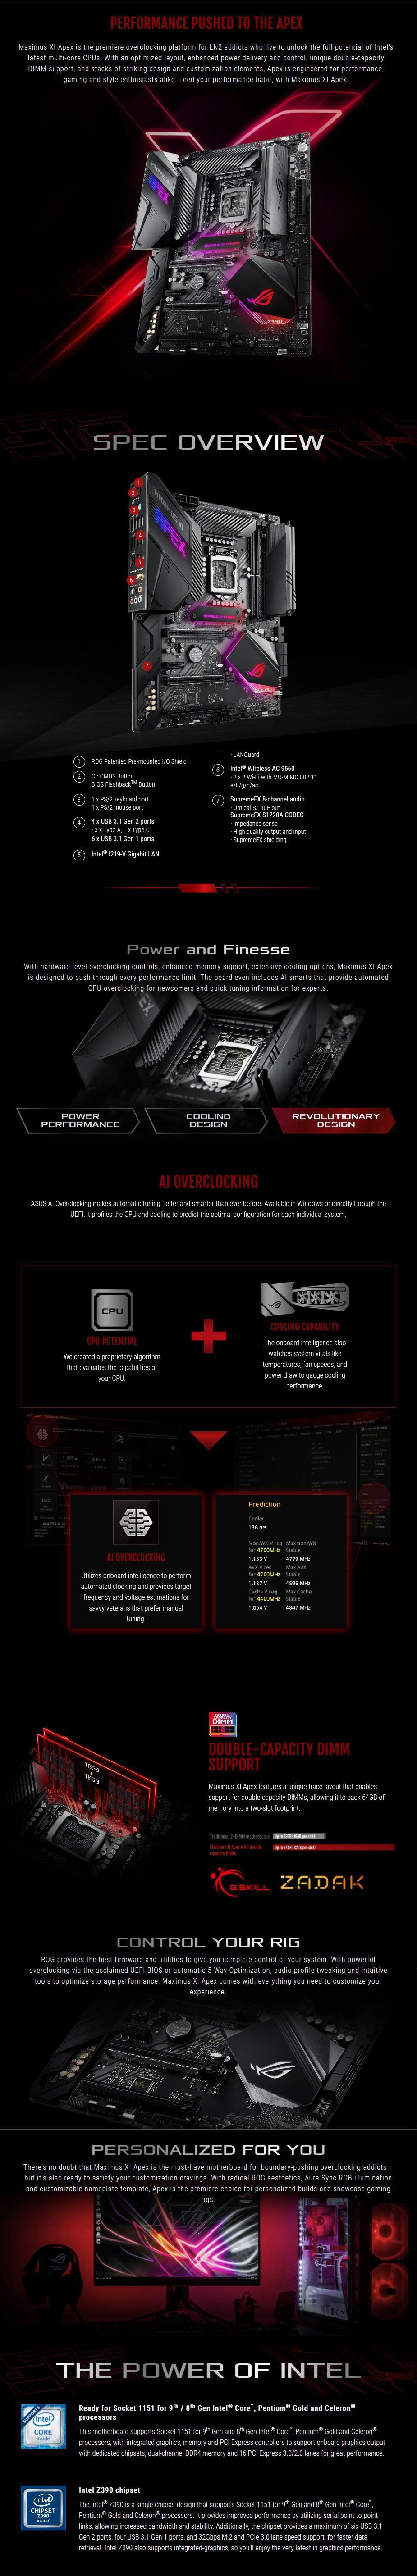 ASUS ROG Z390 MAXIMUS XI APEX LGA 1151 ATX Motherboard - Overview 1